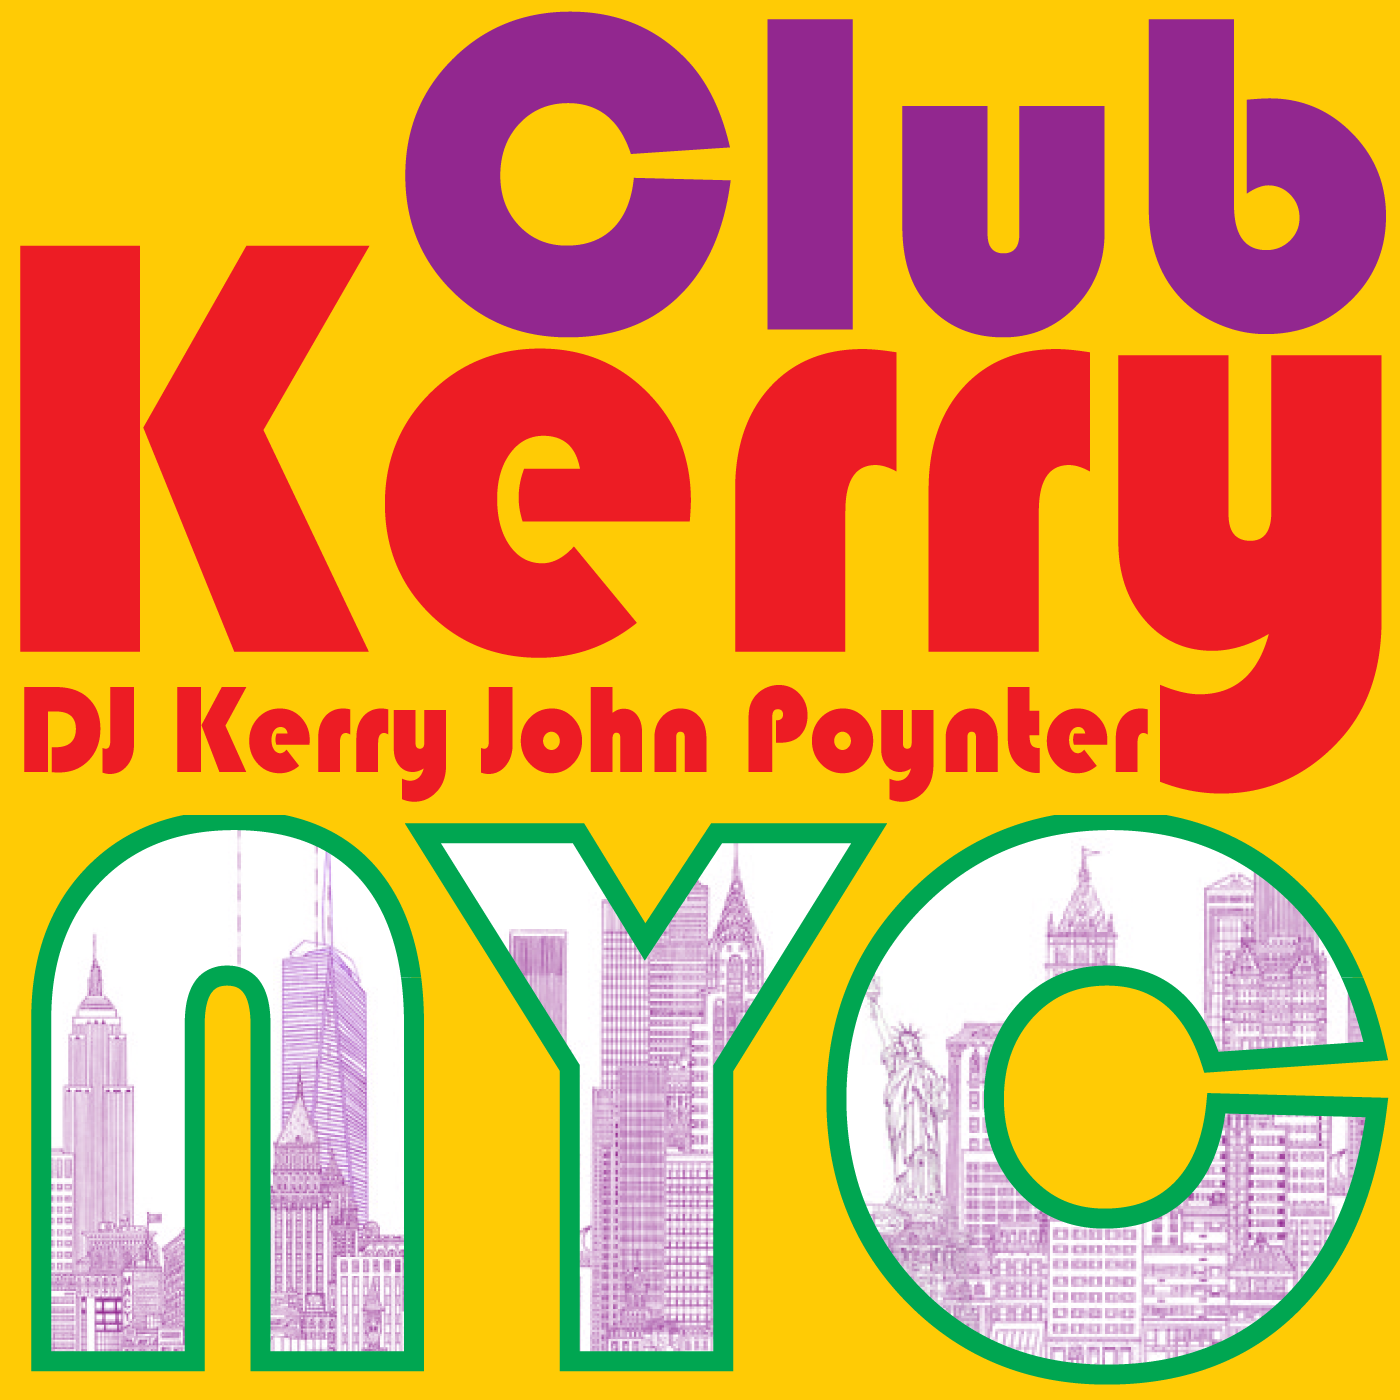 Let's Hear It 4 The Boyz 1 (1/15/09) 13th Anniversary! - Club Kerry NYC show art